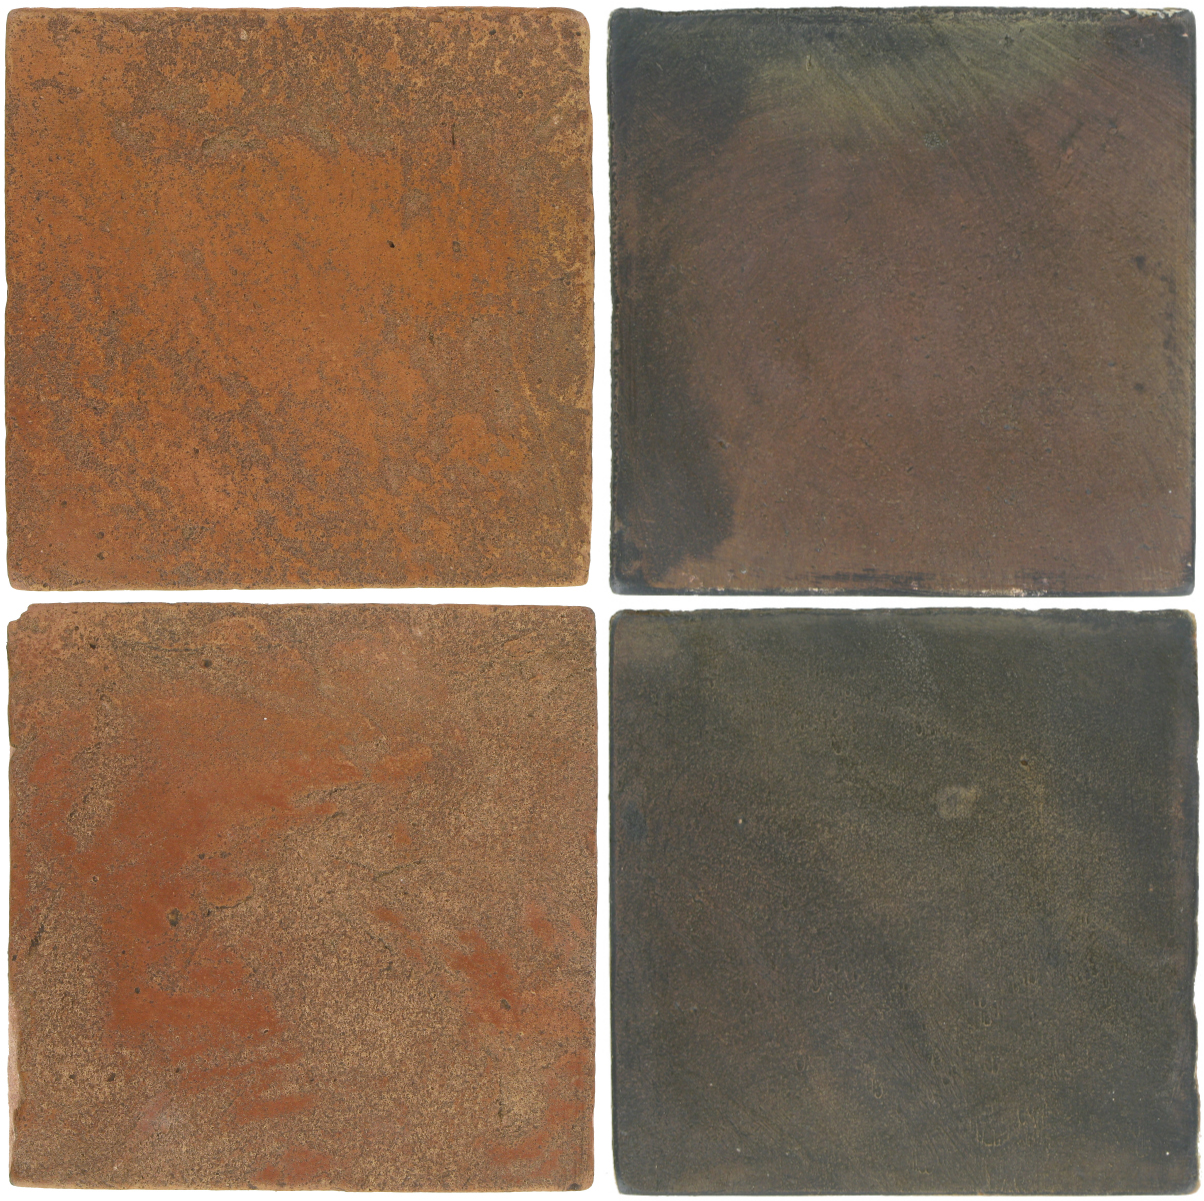 Pedralbes Antique Terracotta  2 Color Combinations  VTG-PSTR Traditional + OHS-PSTG Terra Grey